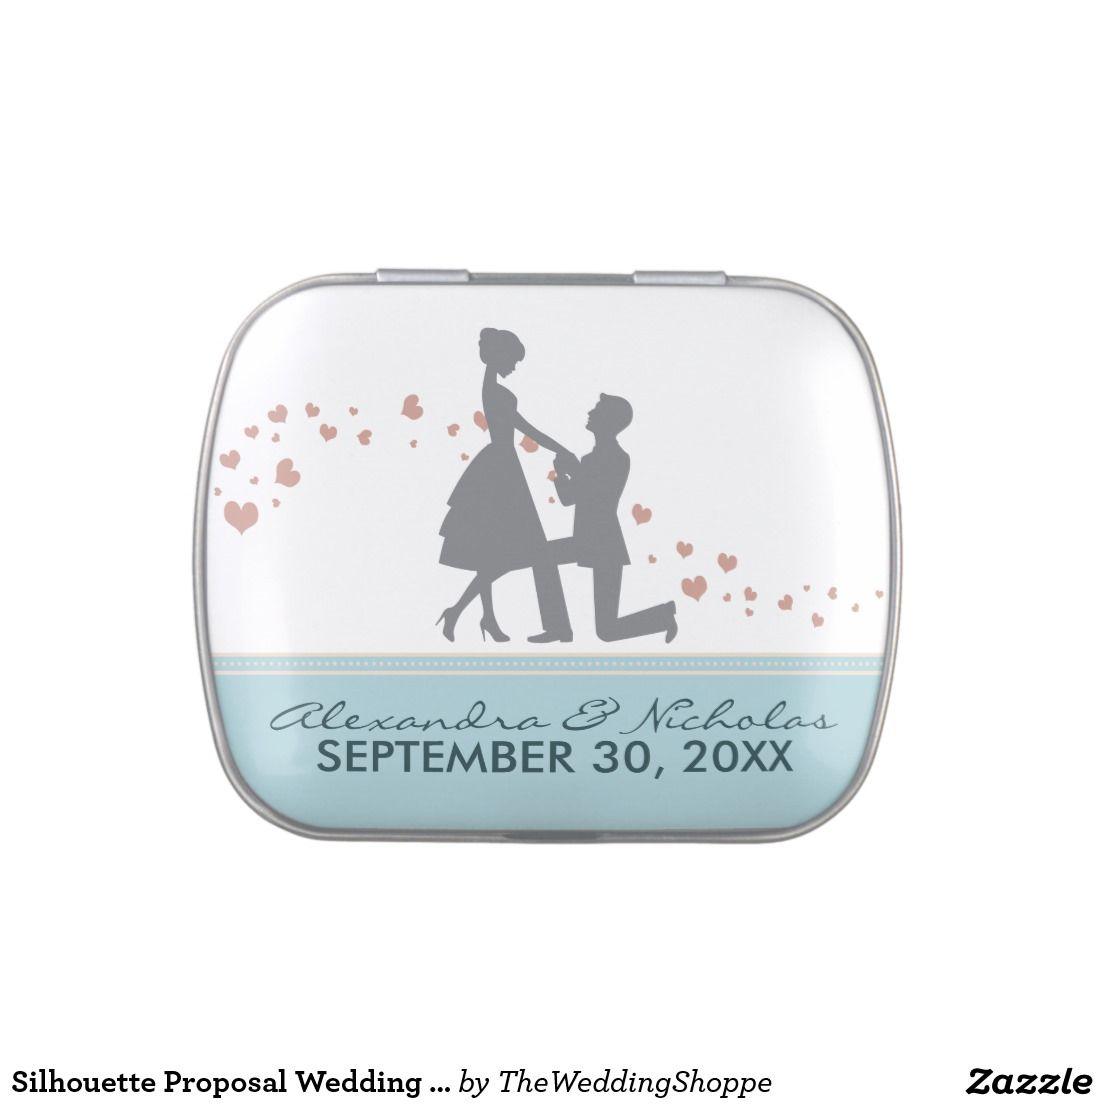 Enchanting Tins For Wedding Favors Crest - Wedding Idea 2018 ...